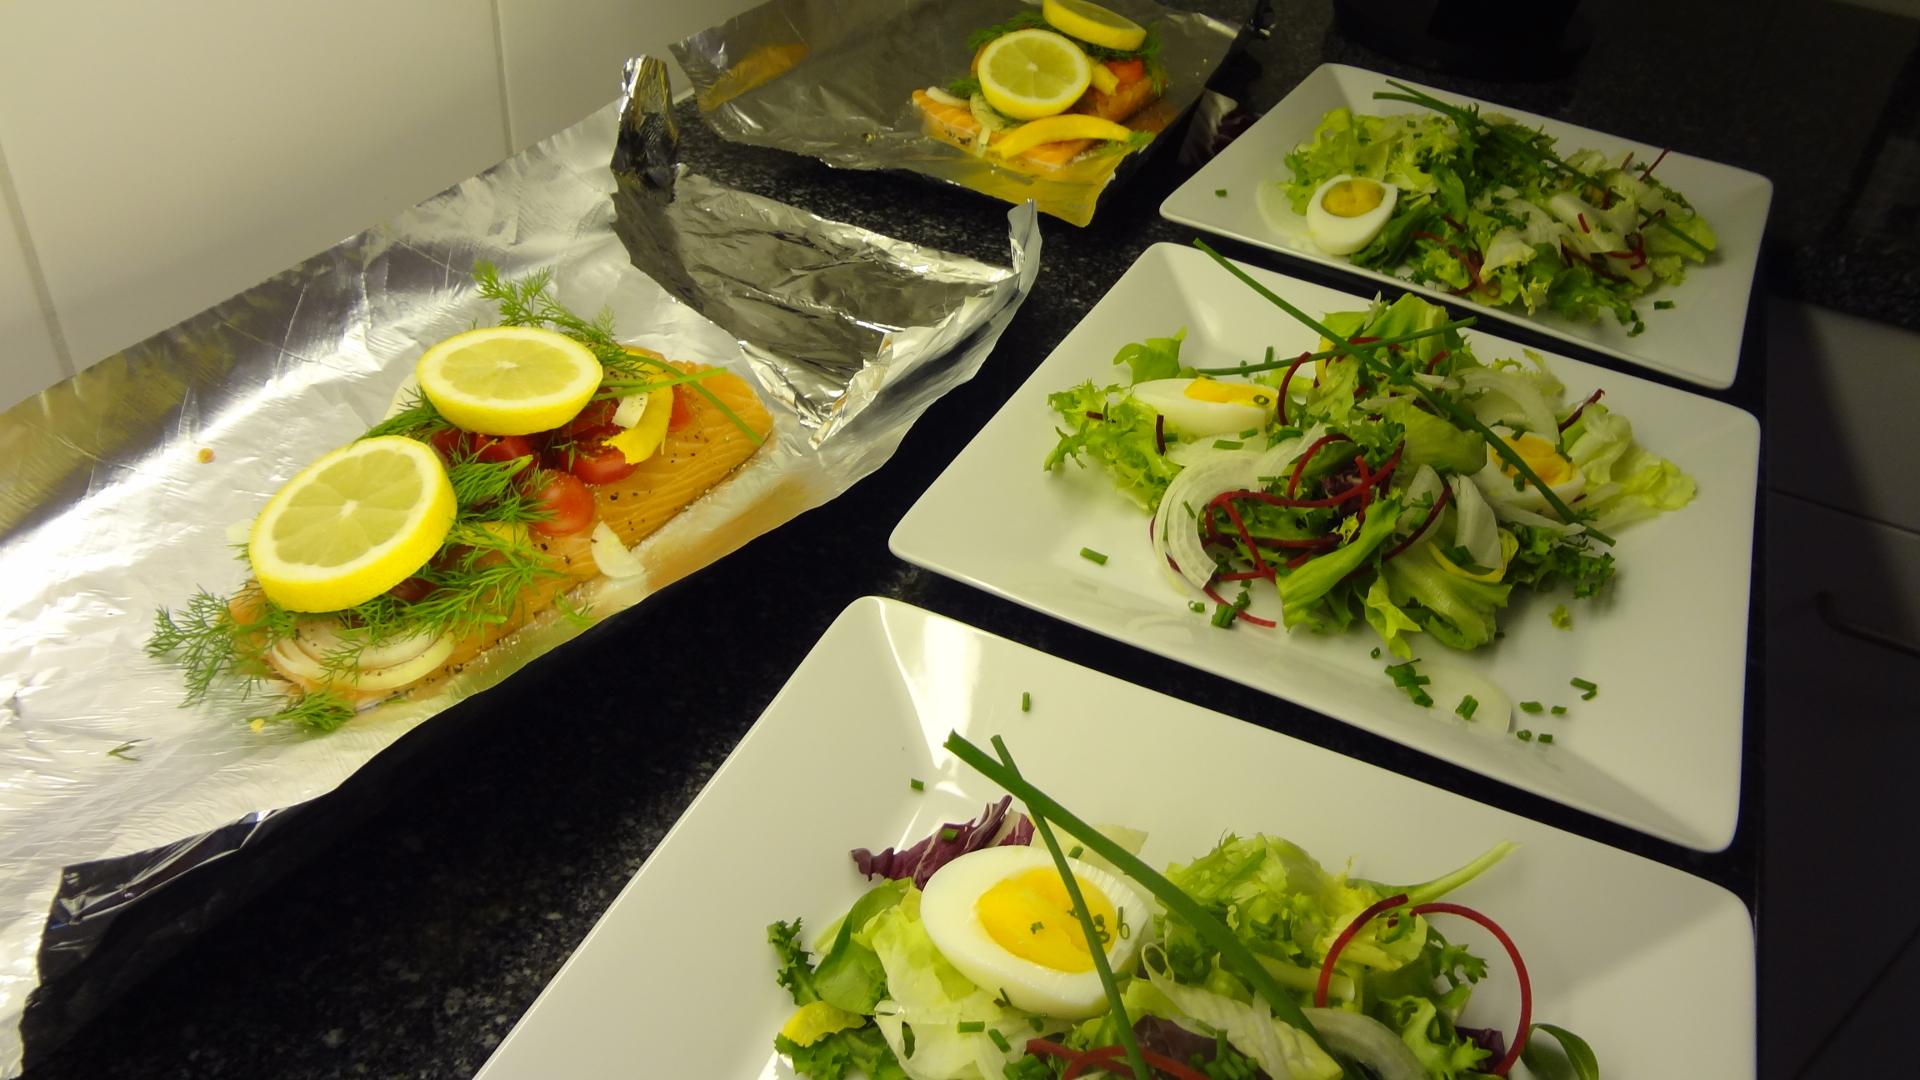 https://foodloader.net/xSh_2013-11-30_Salmon_Salad.jpg